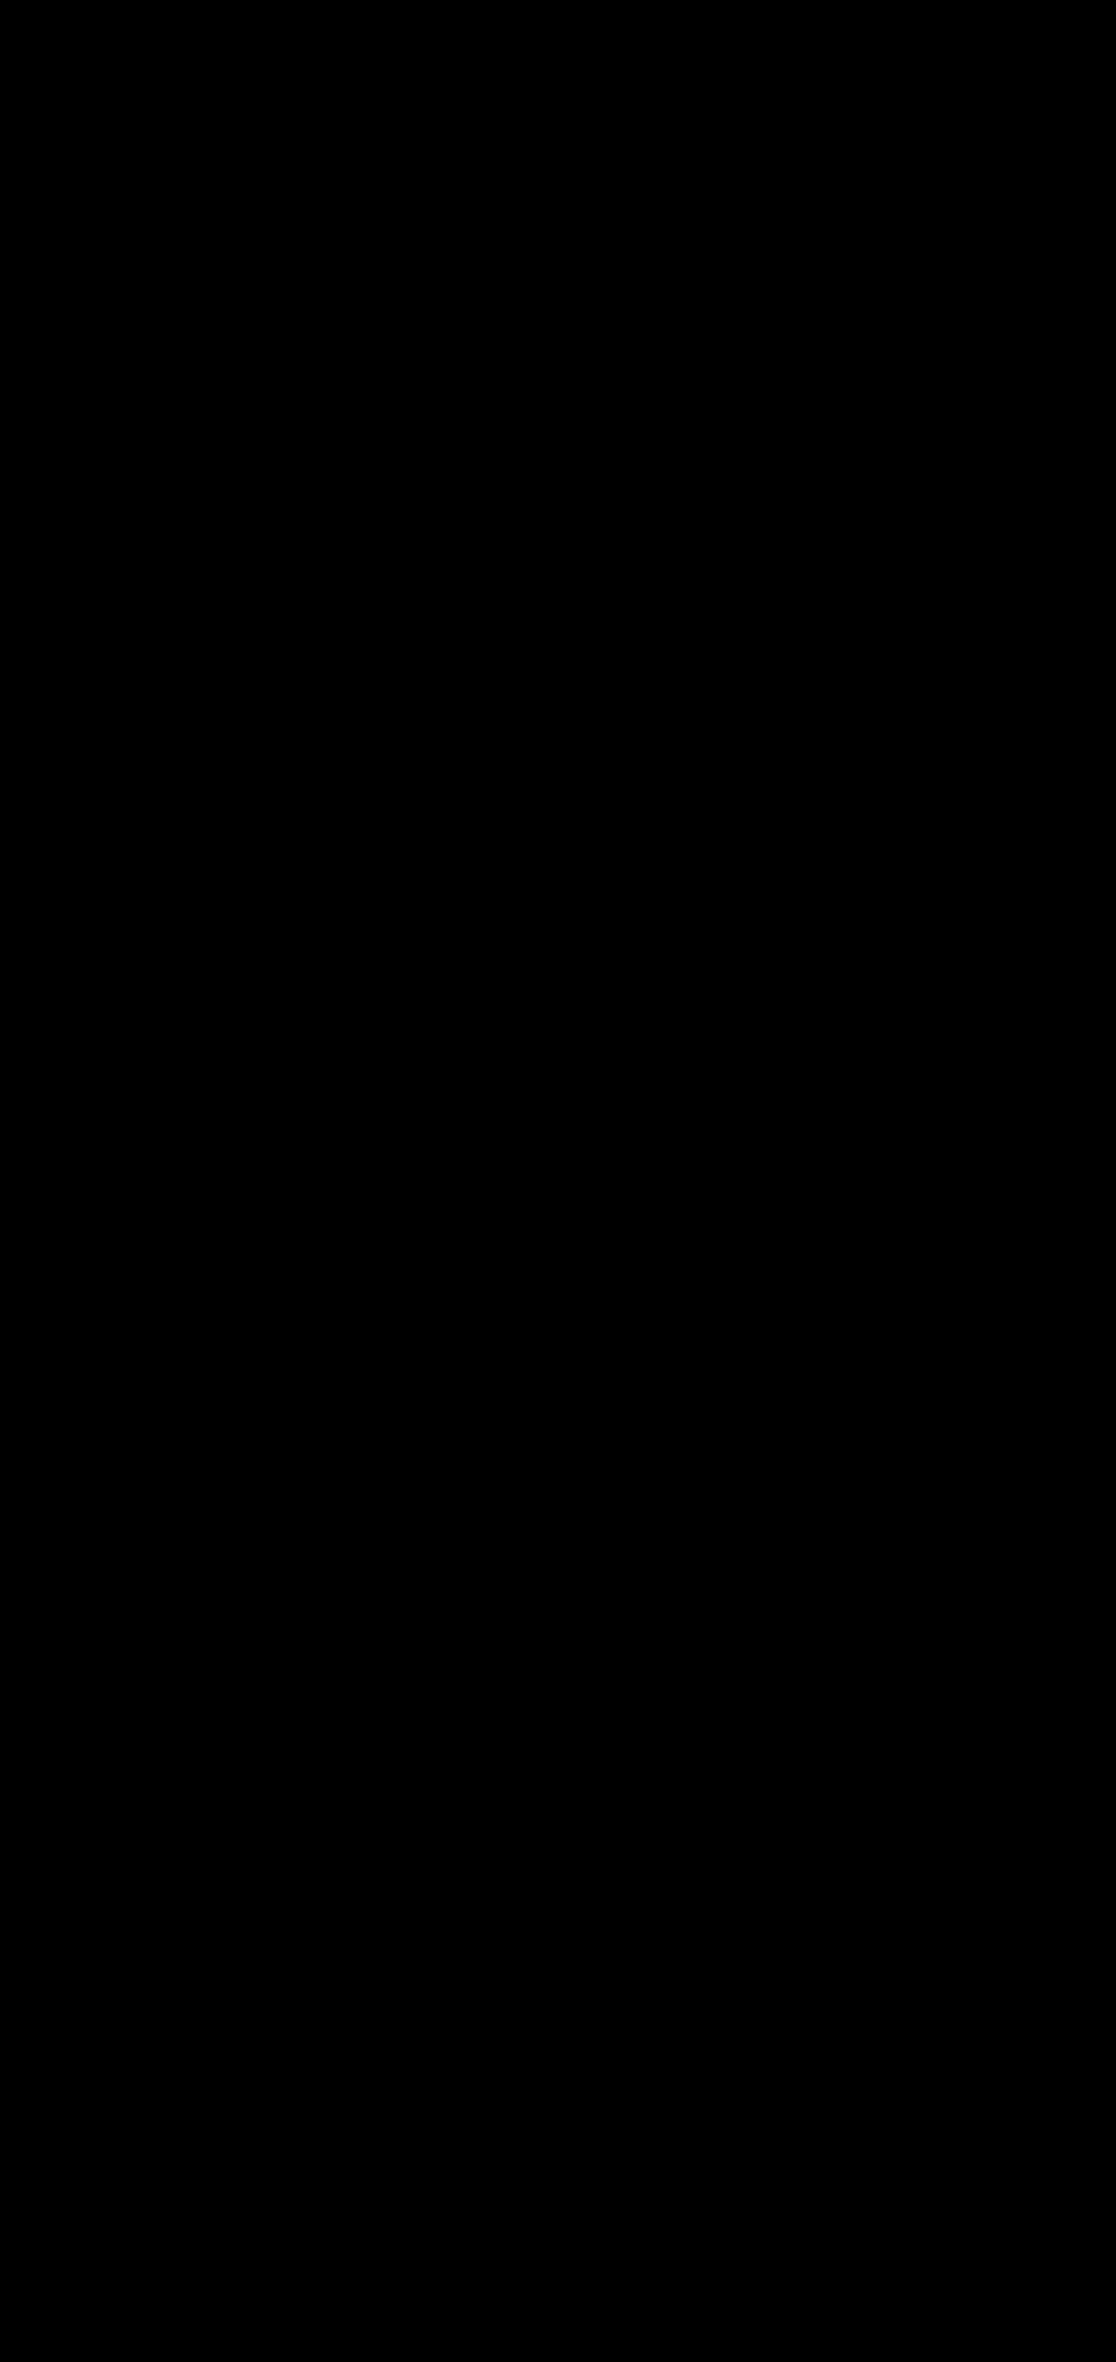 BALLISTOL CHAMPÚ PARA CABALLO LÚPULO Y EXTRACTOS DE MACADAMIA 500 ML